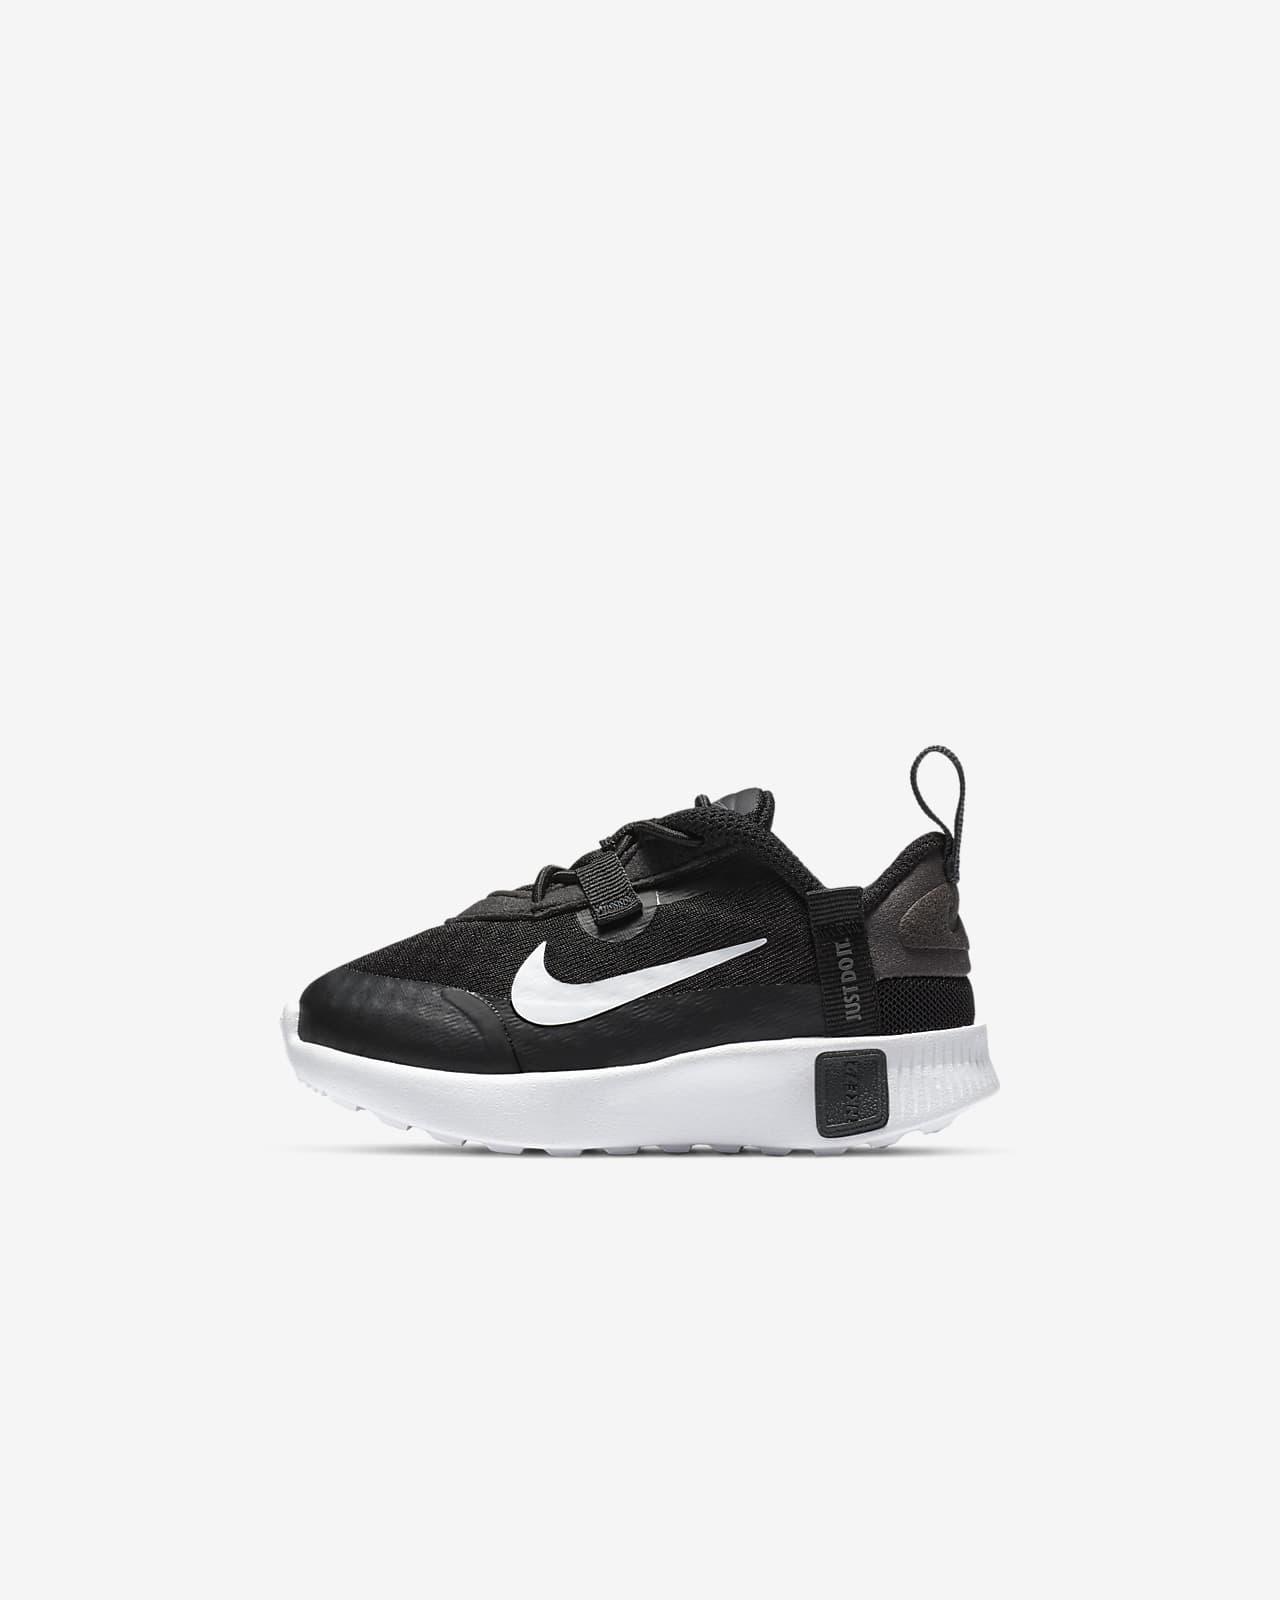 Bota Nike Reposto pro kojence abatolata